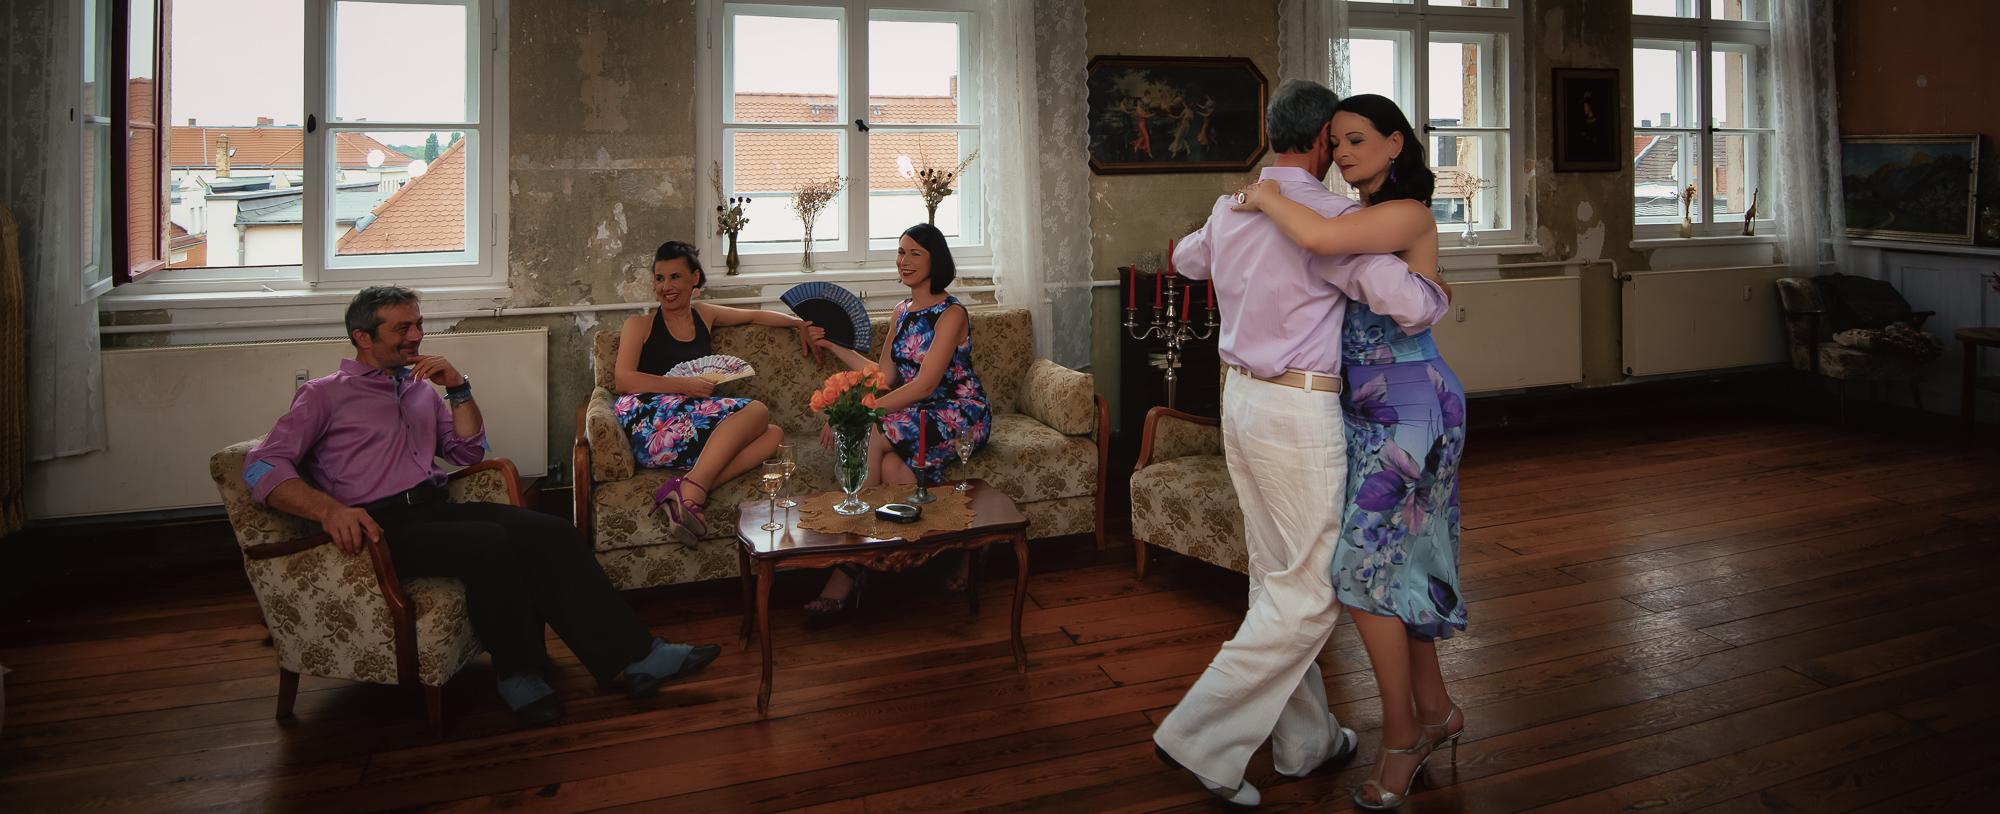 tangoklyder.de - handgefertige tangomode aus leipzig